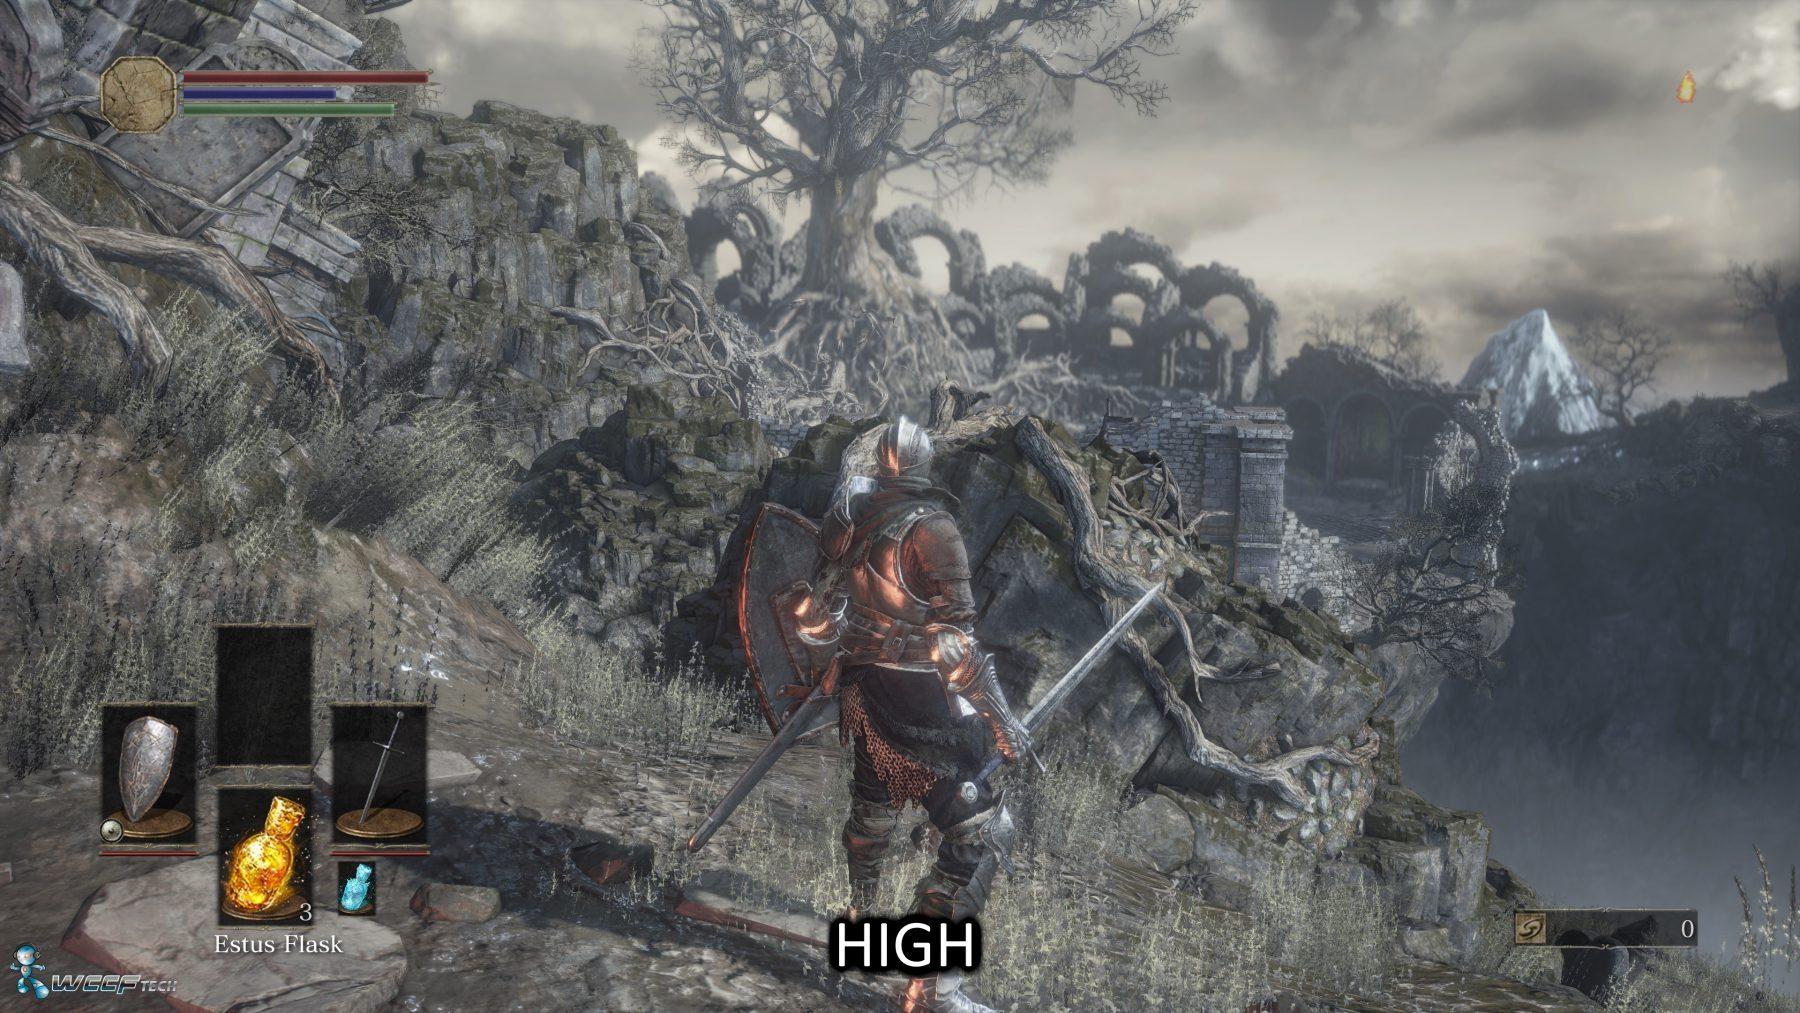 Dark Souls 3 high